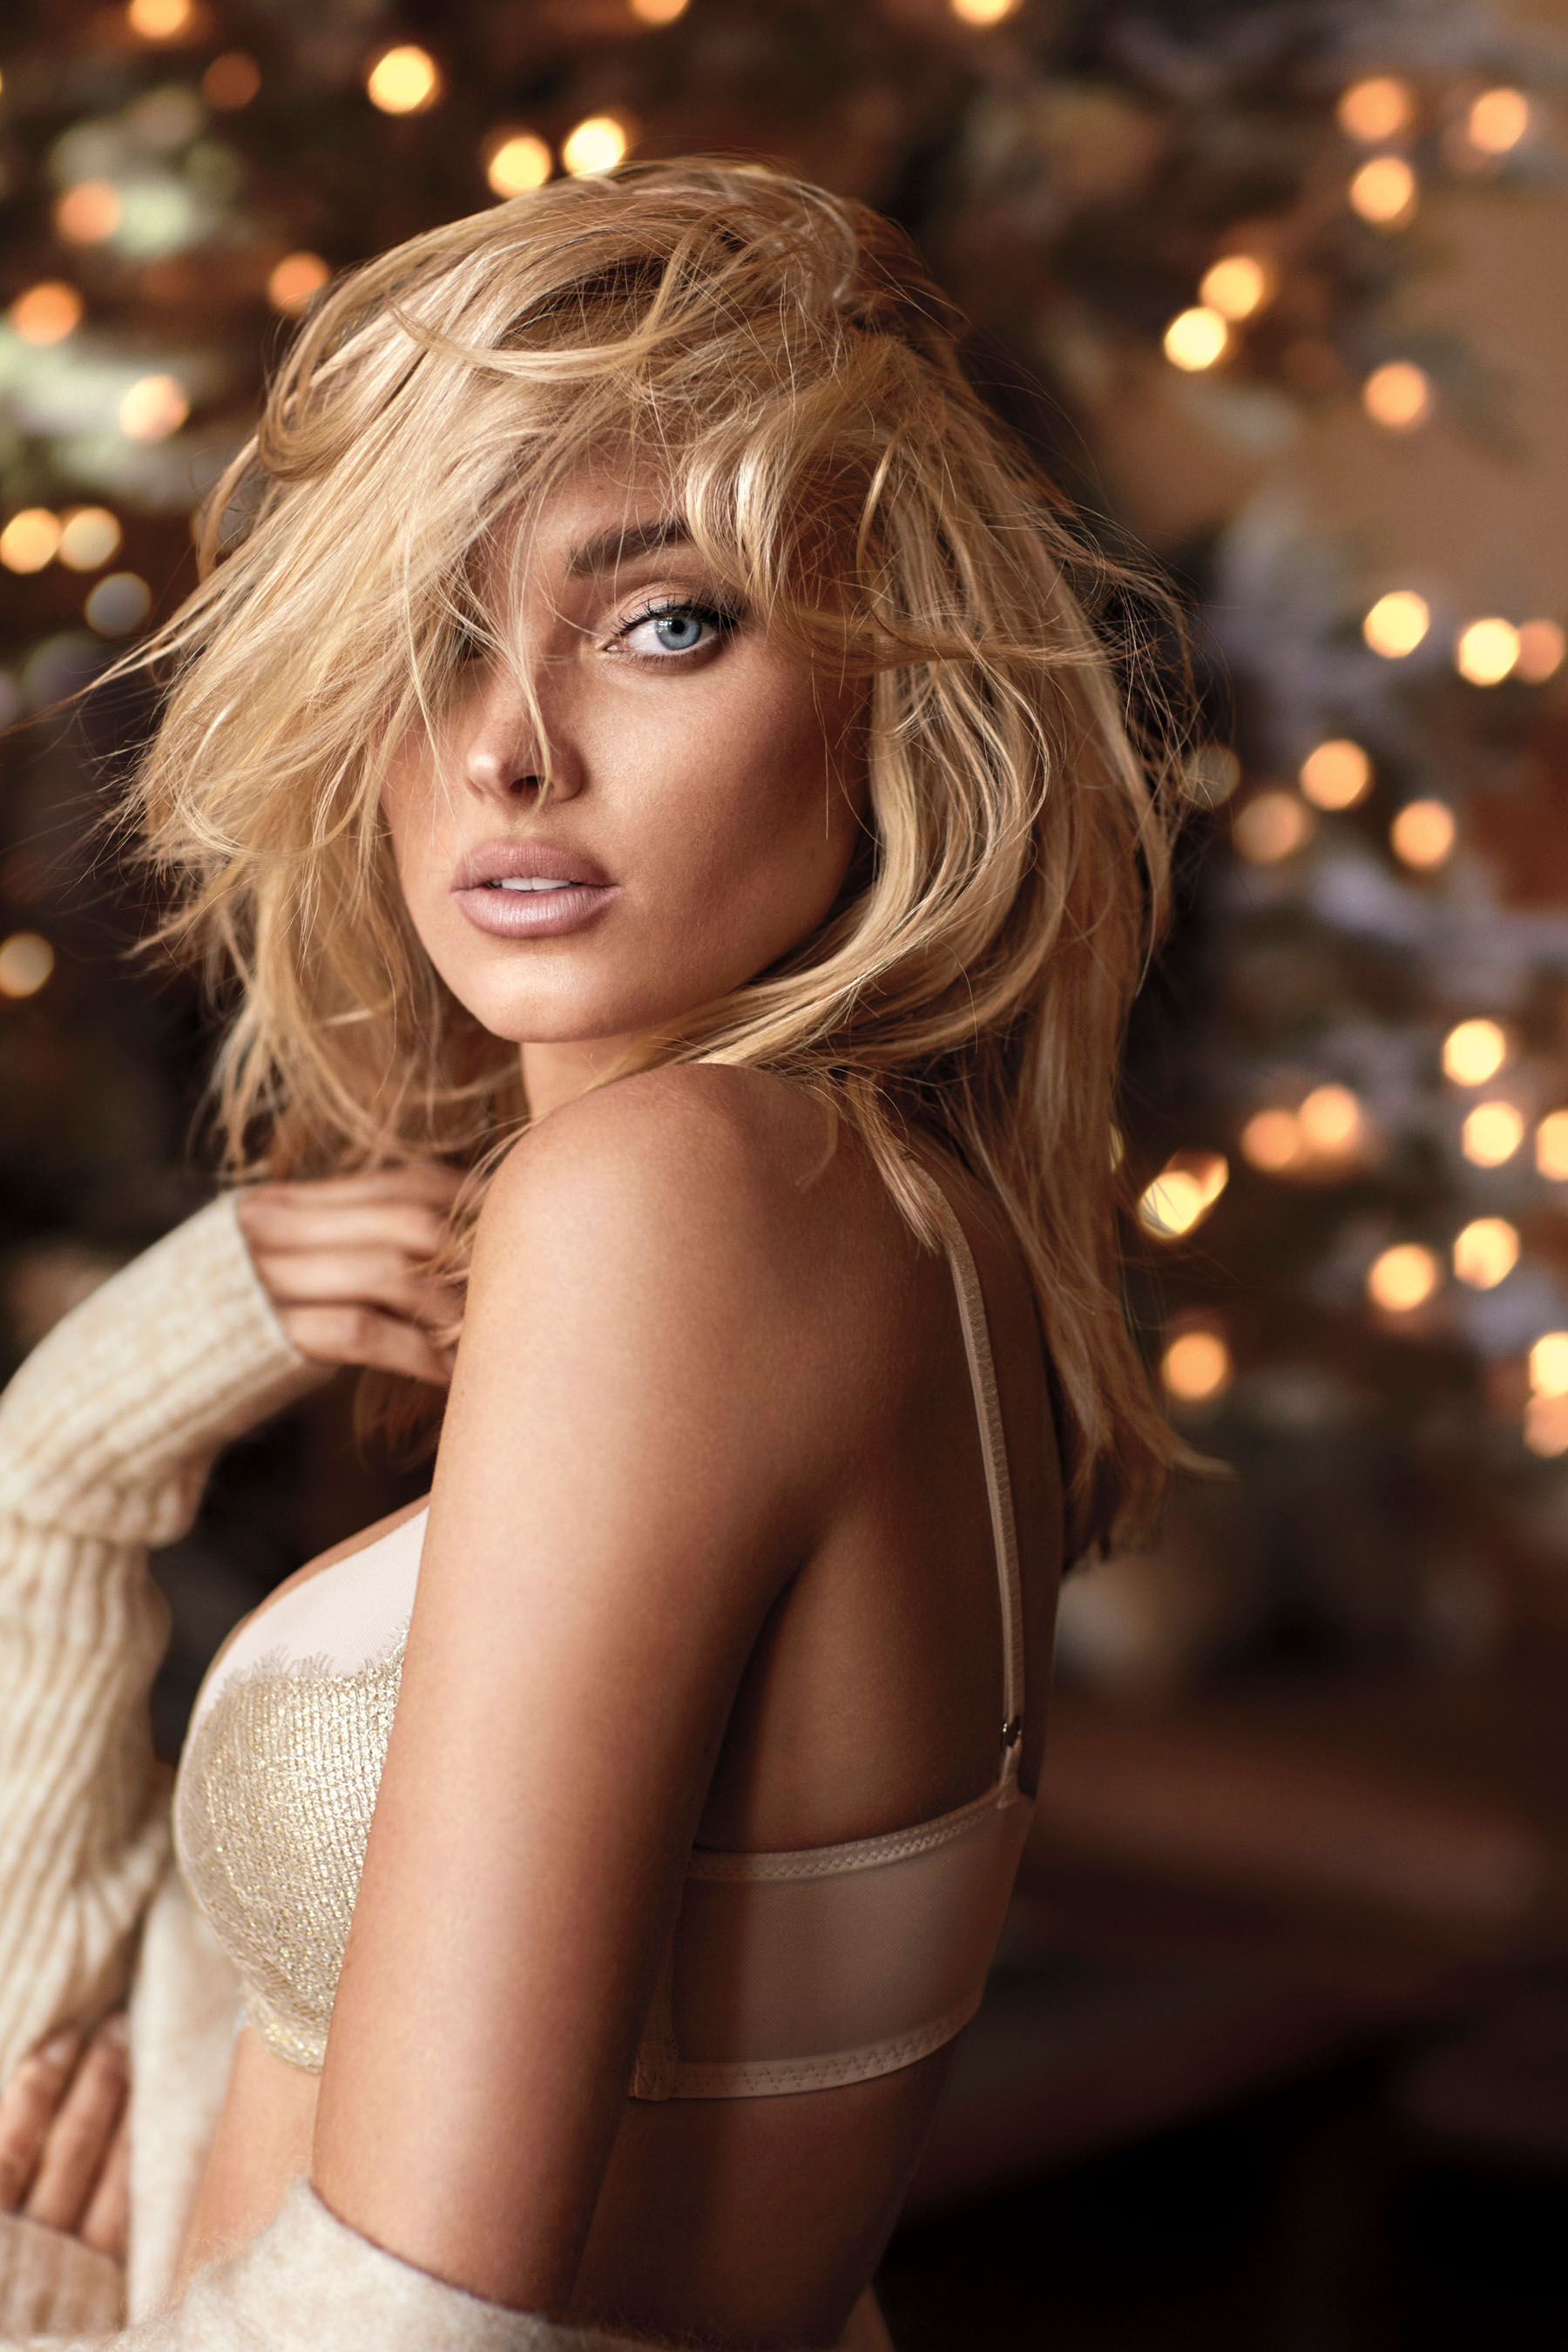 Victorias-Secret-holiday-2017-ad-campaign-the-impression-08